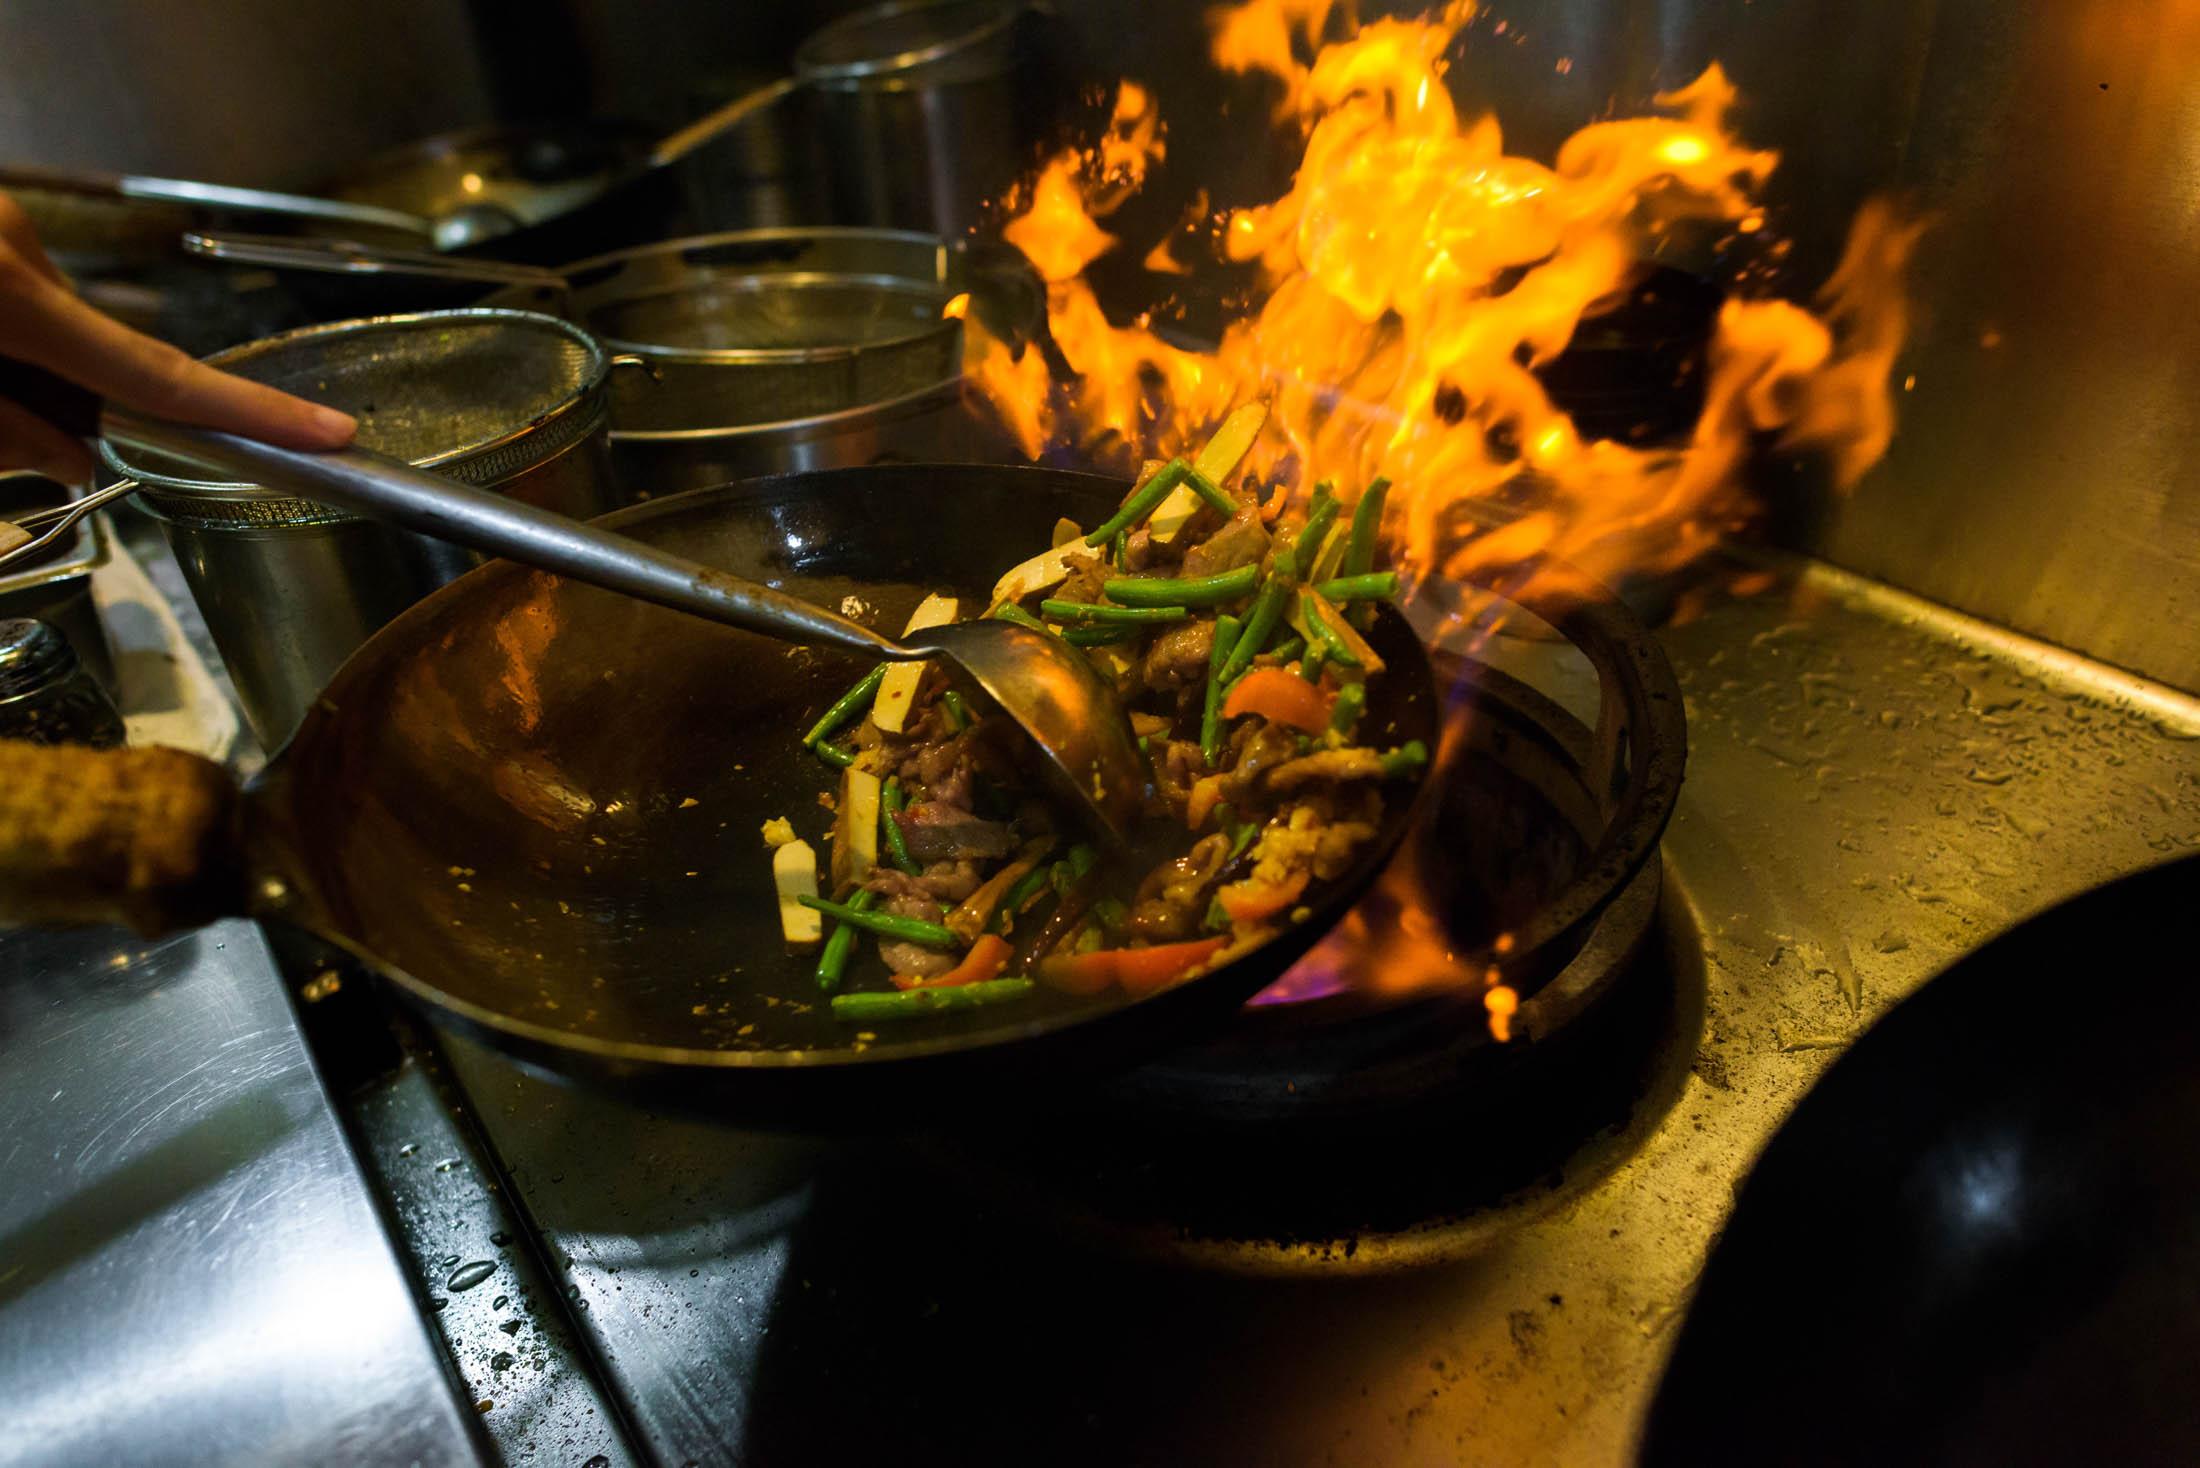 7873_Rangoon_Ruby_Burlingame_Food_Photography.jpg